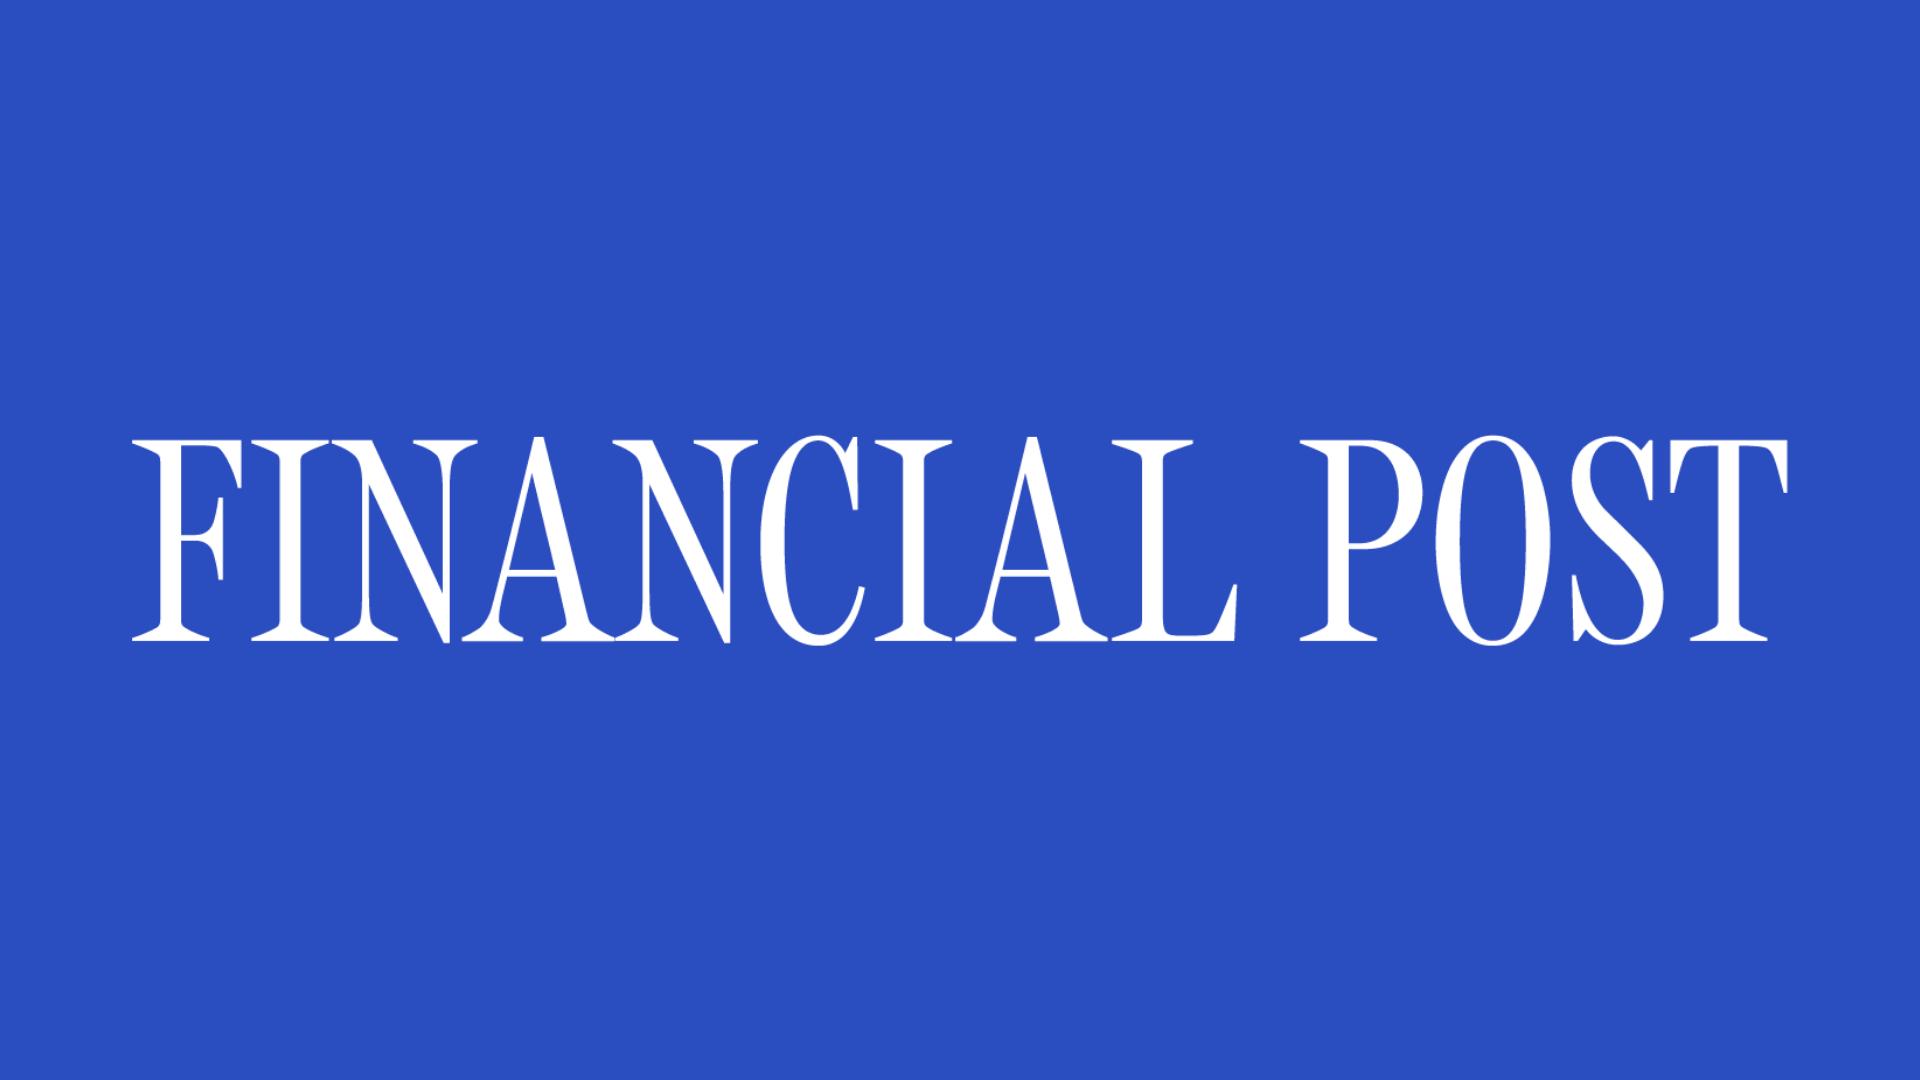 financial post